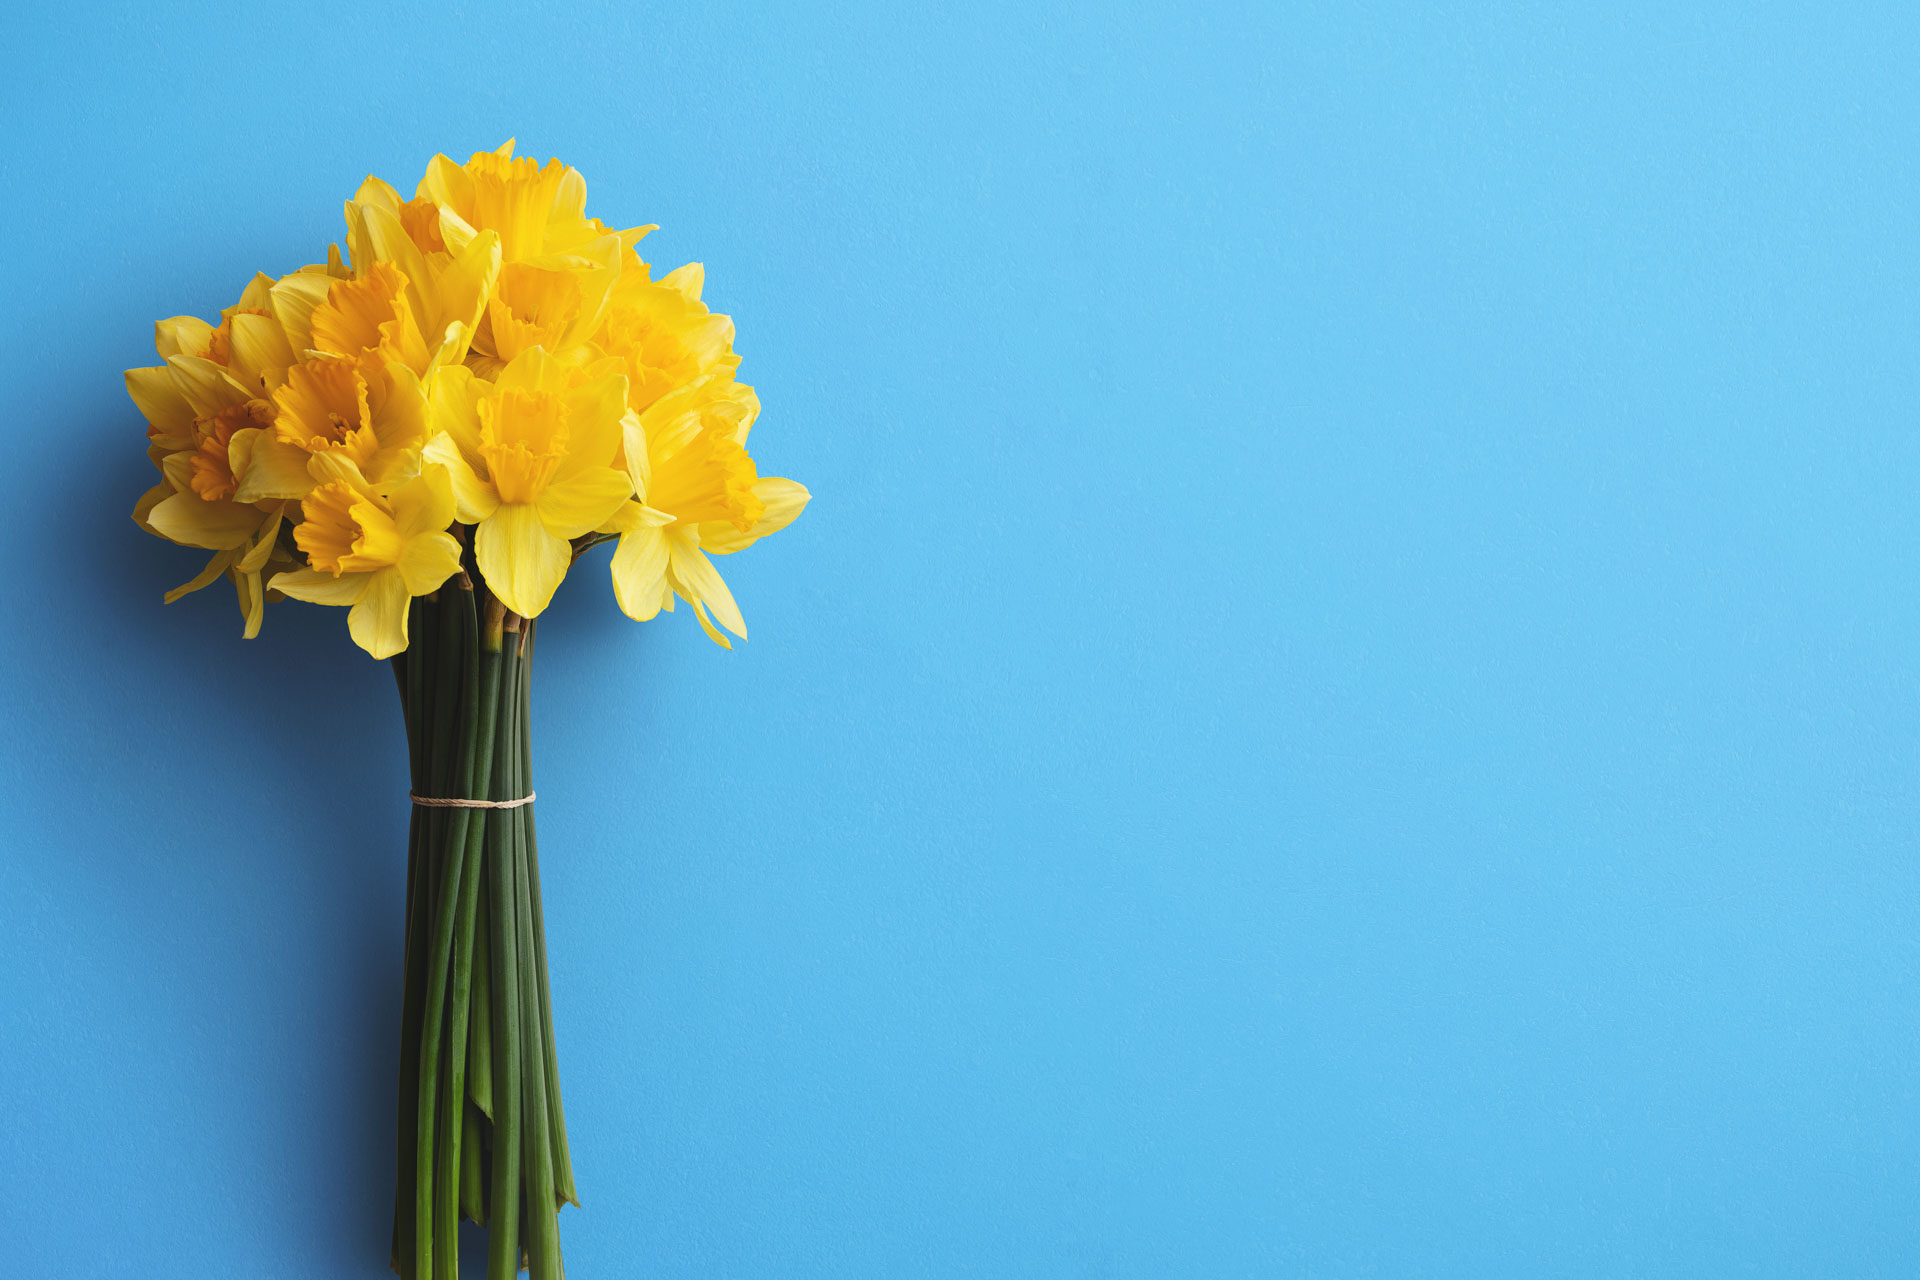 daffodils custom scene creator template 3 Thumbnail